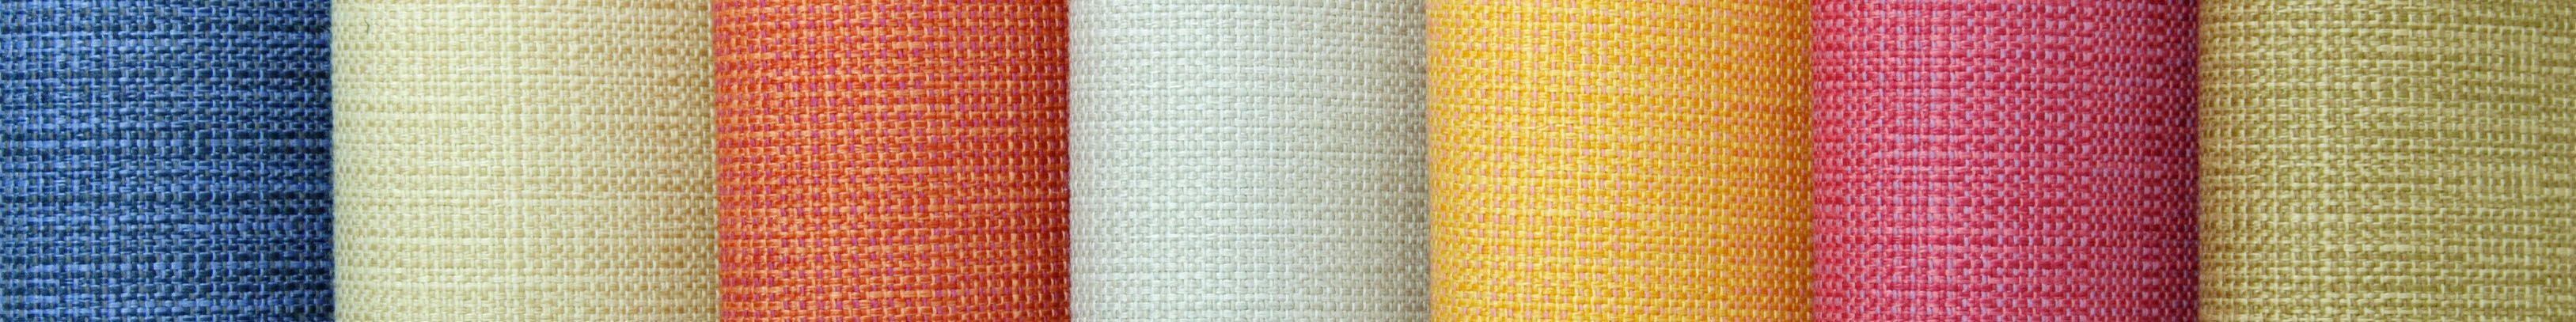 Keper cotton